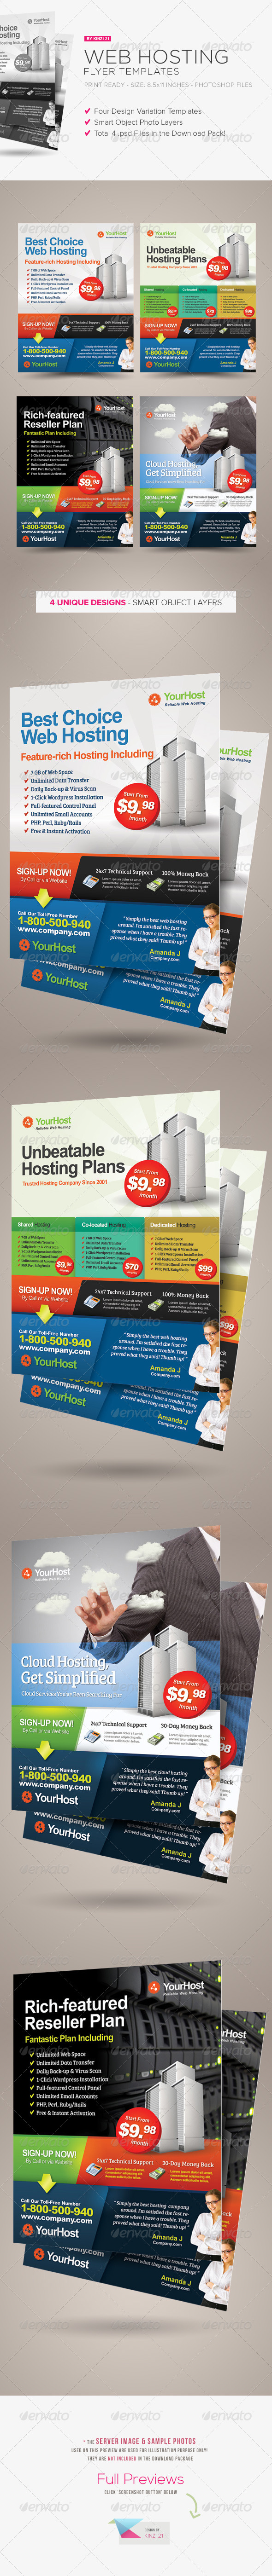 Premium Web Hosting Flyers - Corporate Flyers